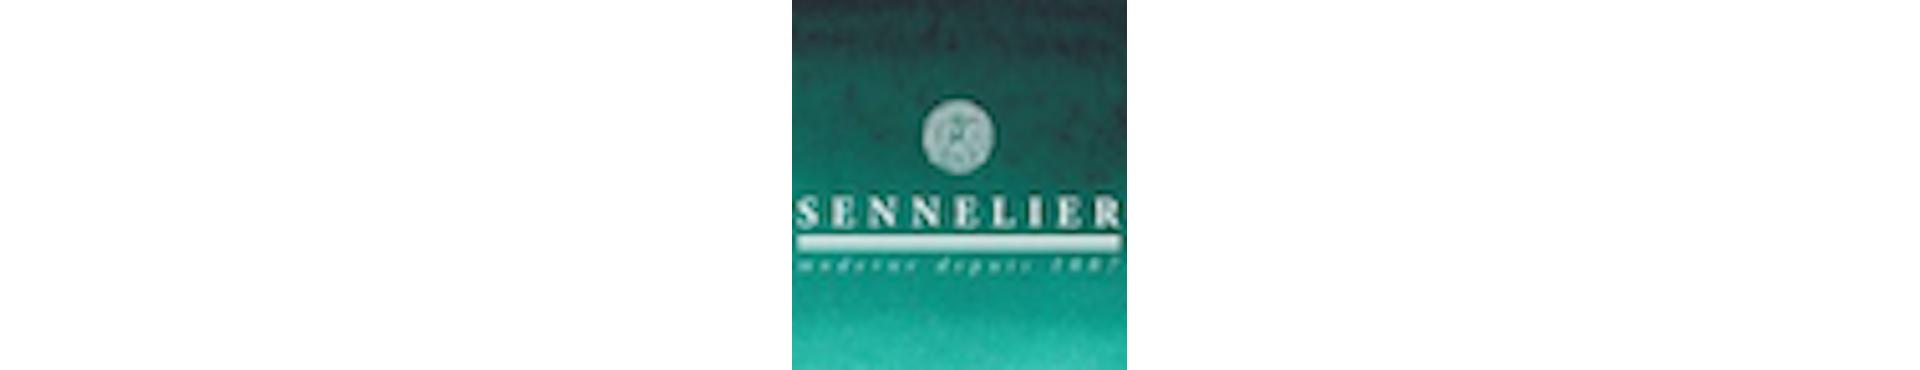 Cajas acuarelas Sennelier